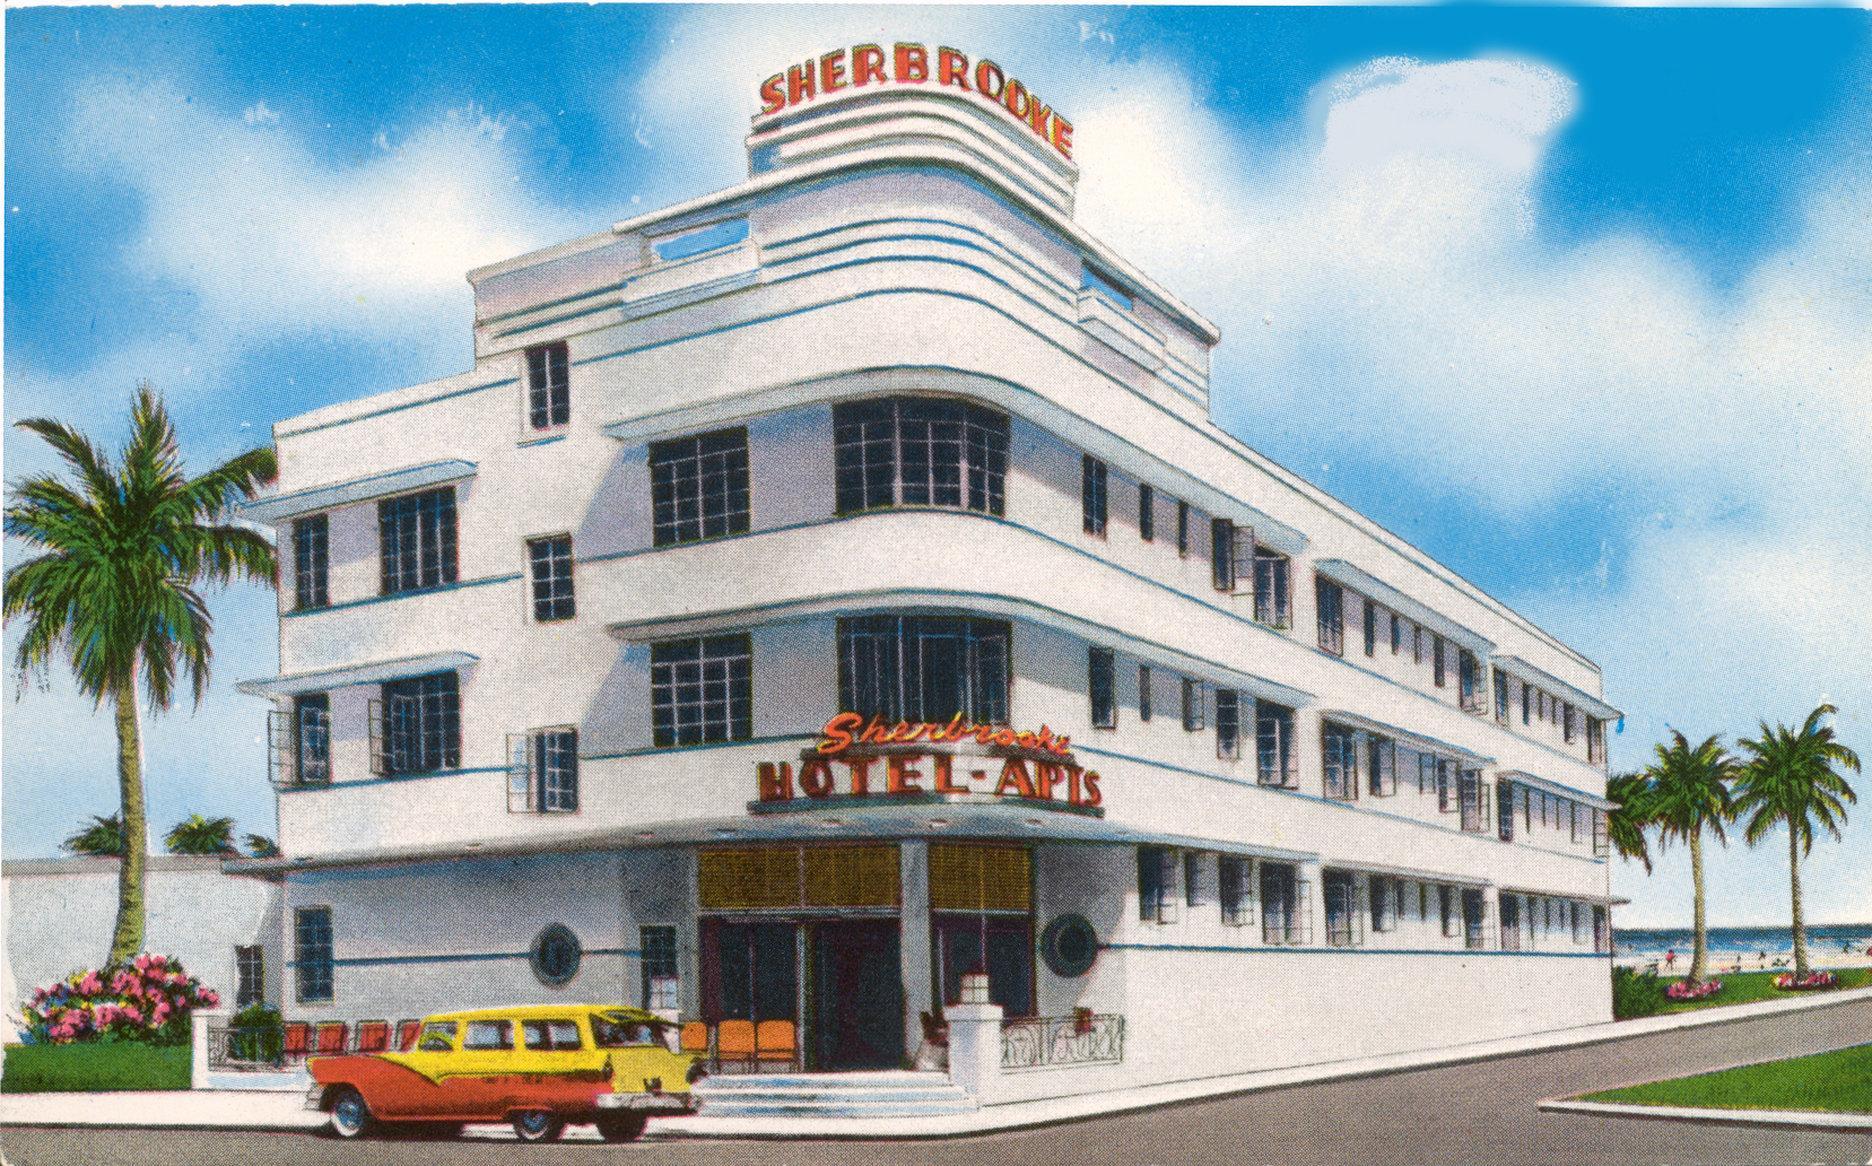 Sherbrooke Hotel